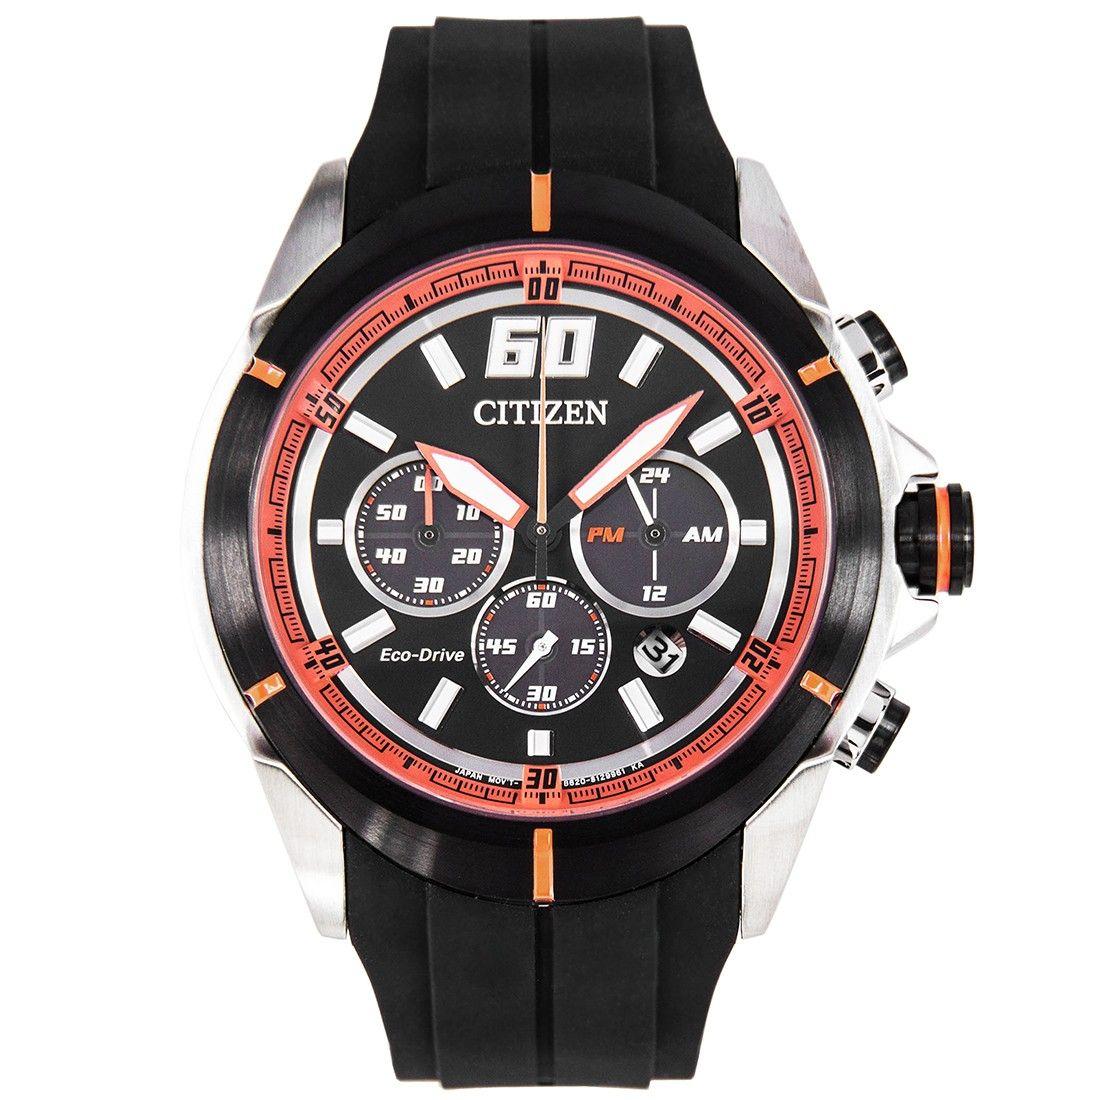 Citizen ecodrive chronograph sports watch ca410502e